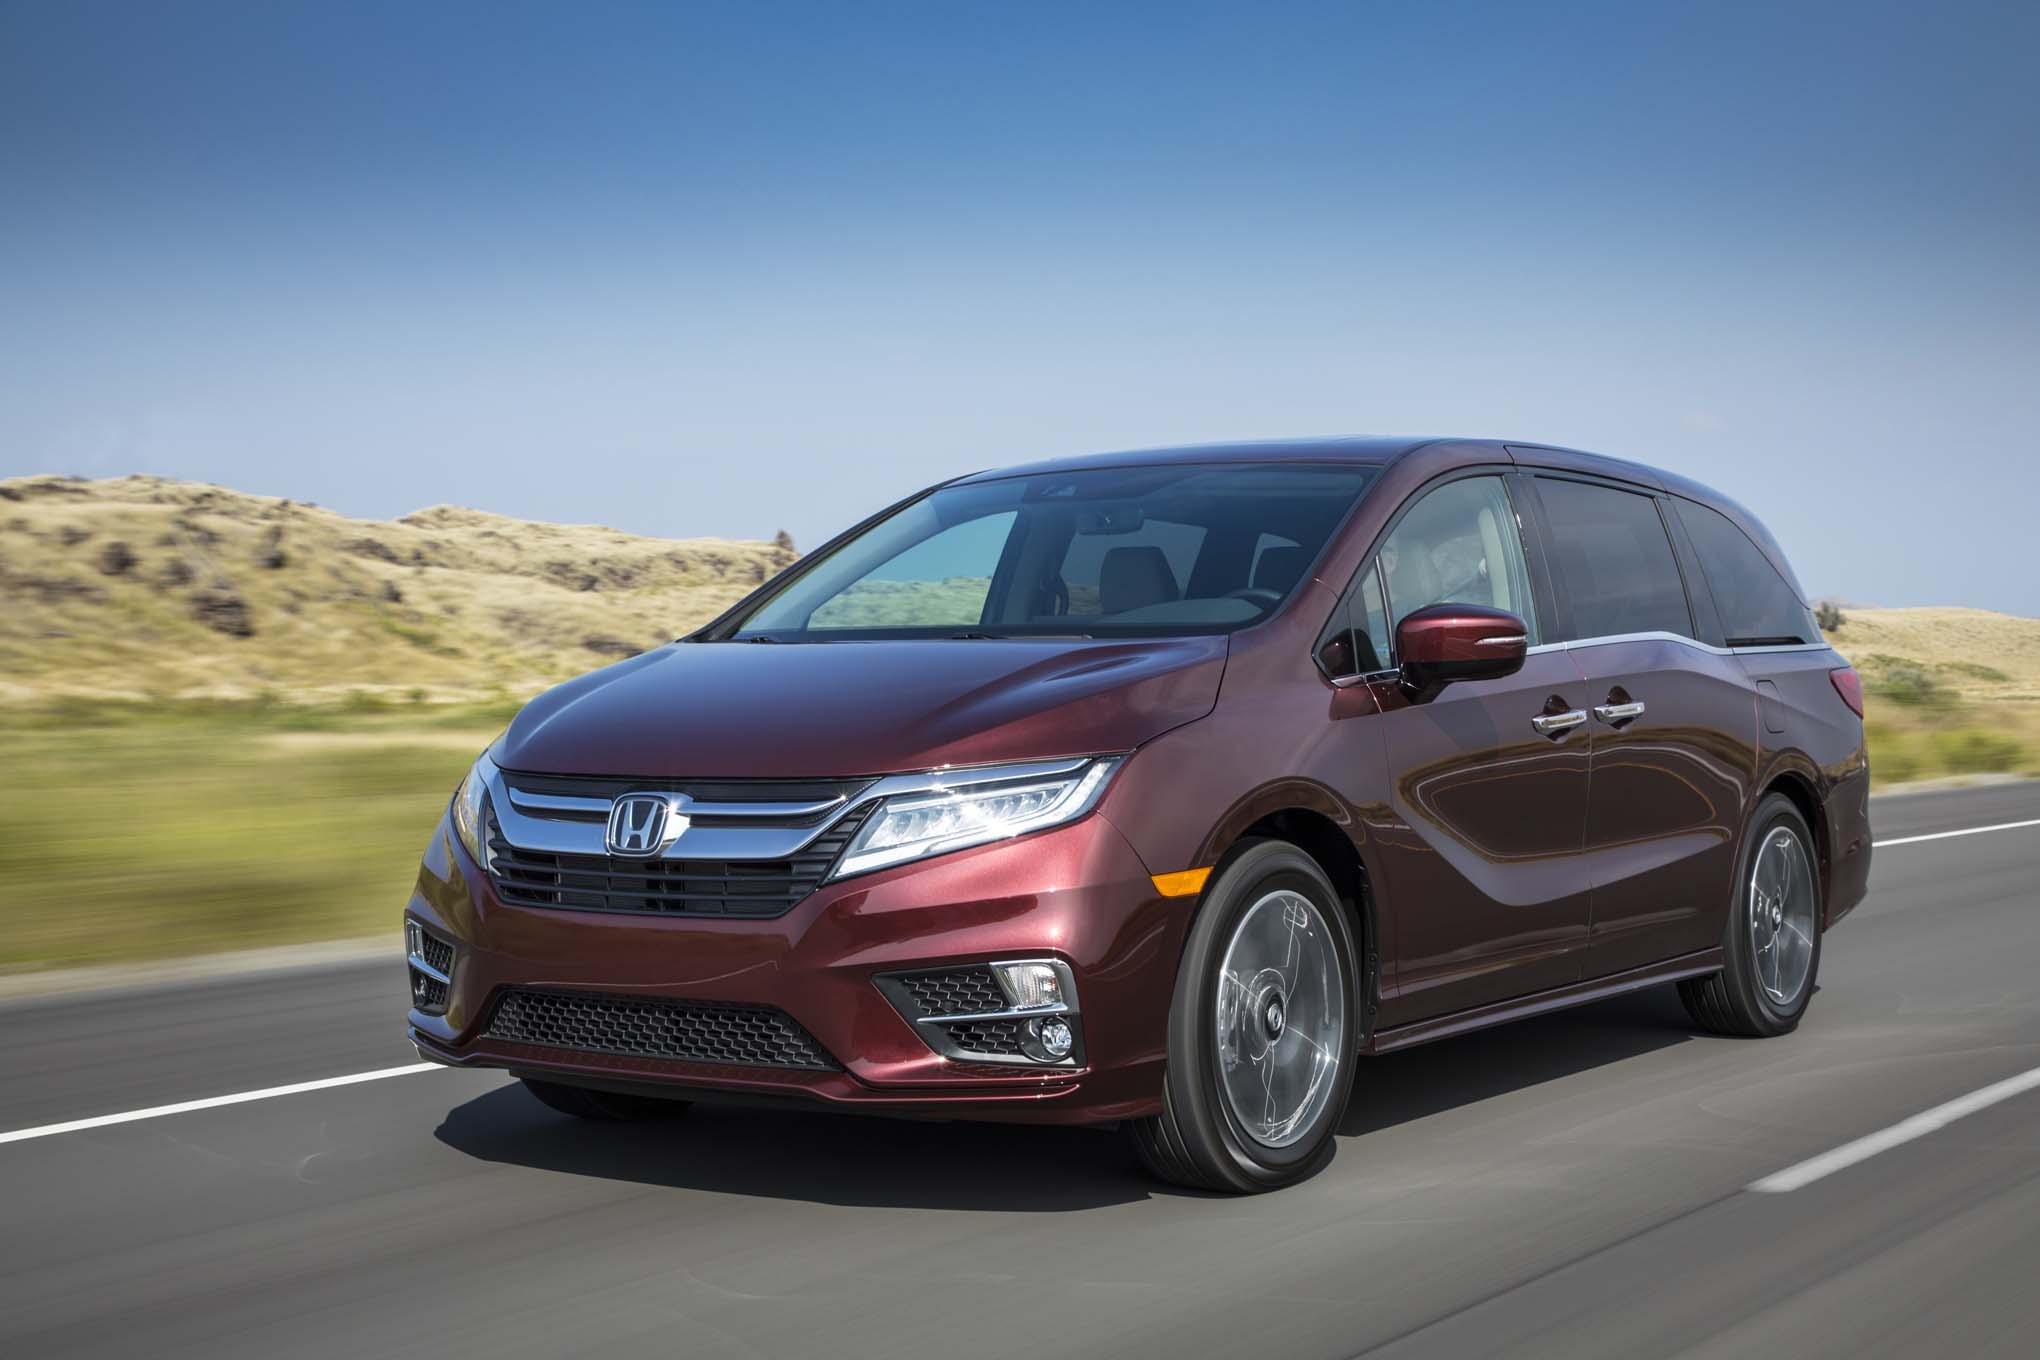 2018 Honda Odyssey Front Three Quarter In Motion 10